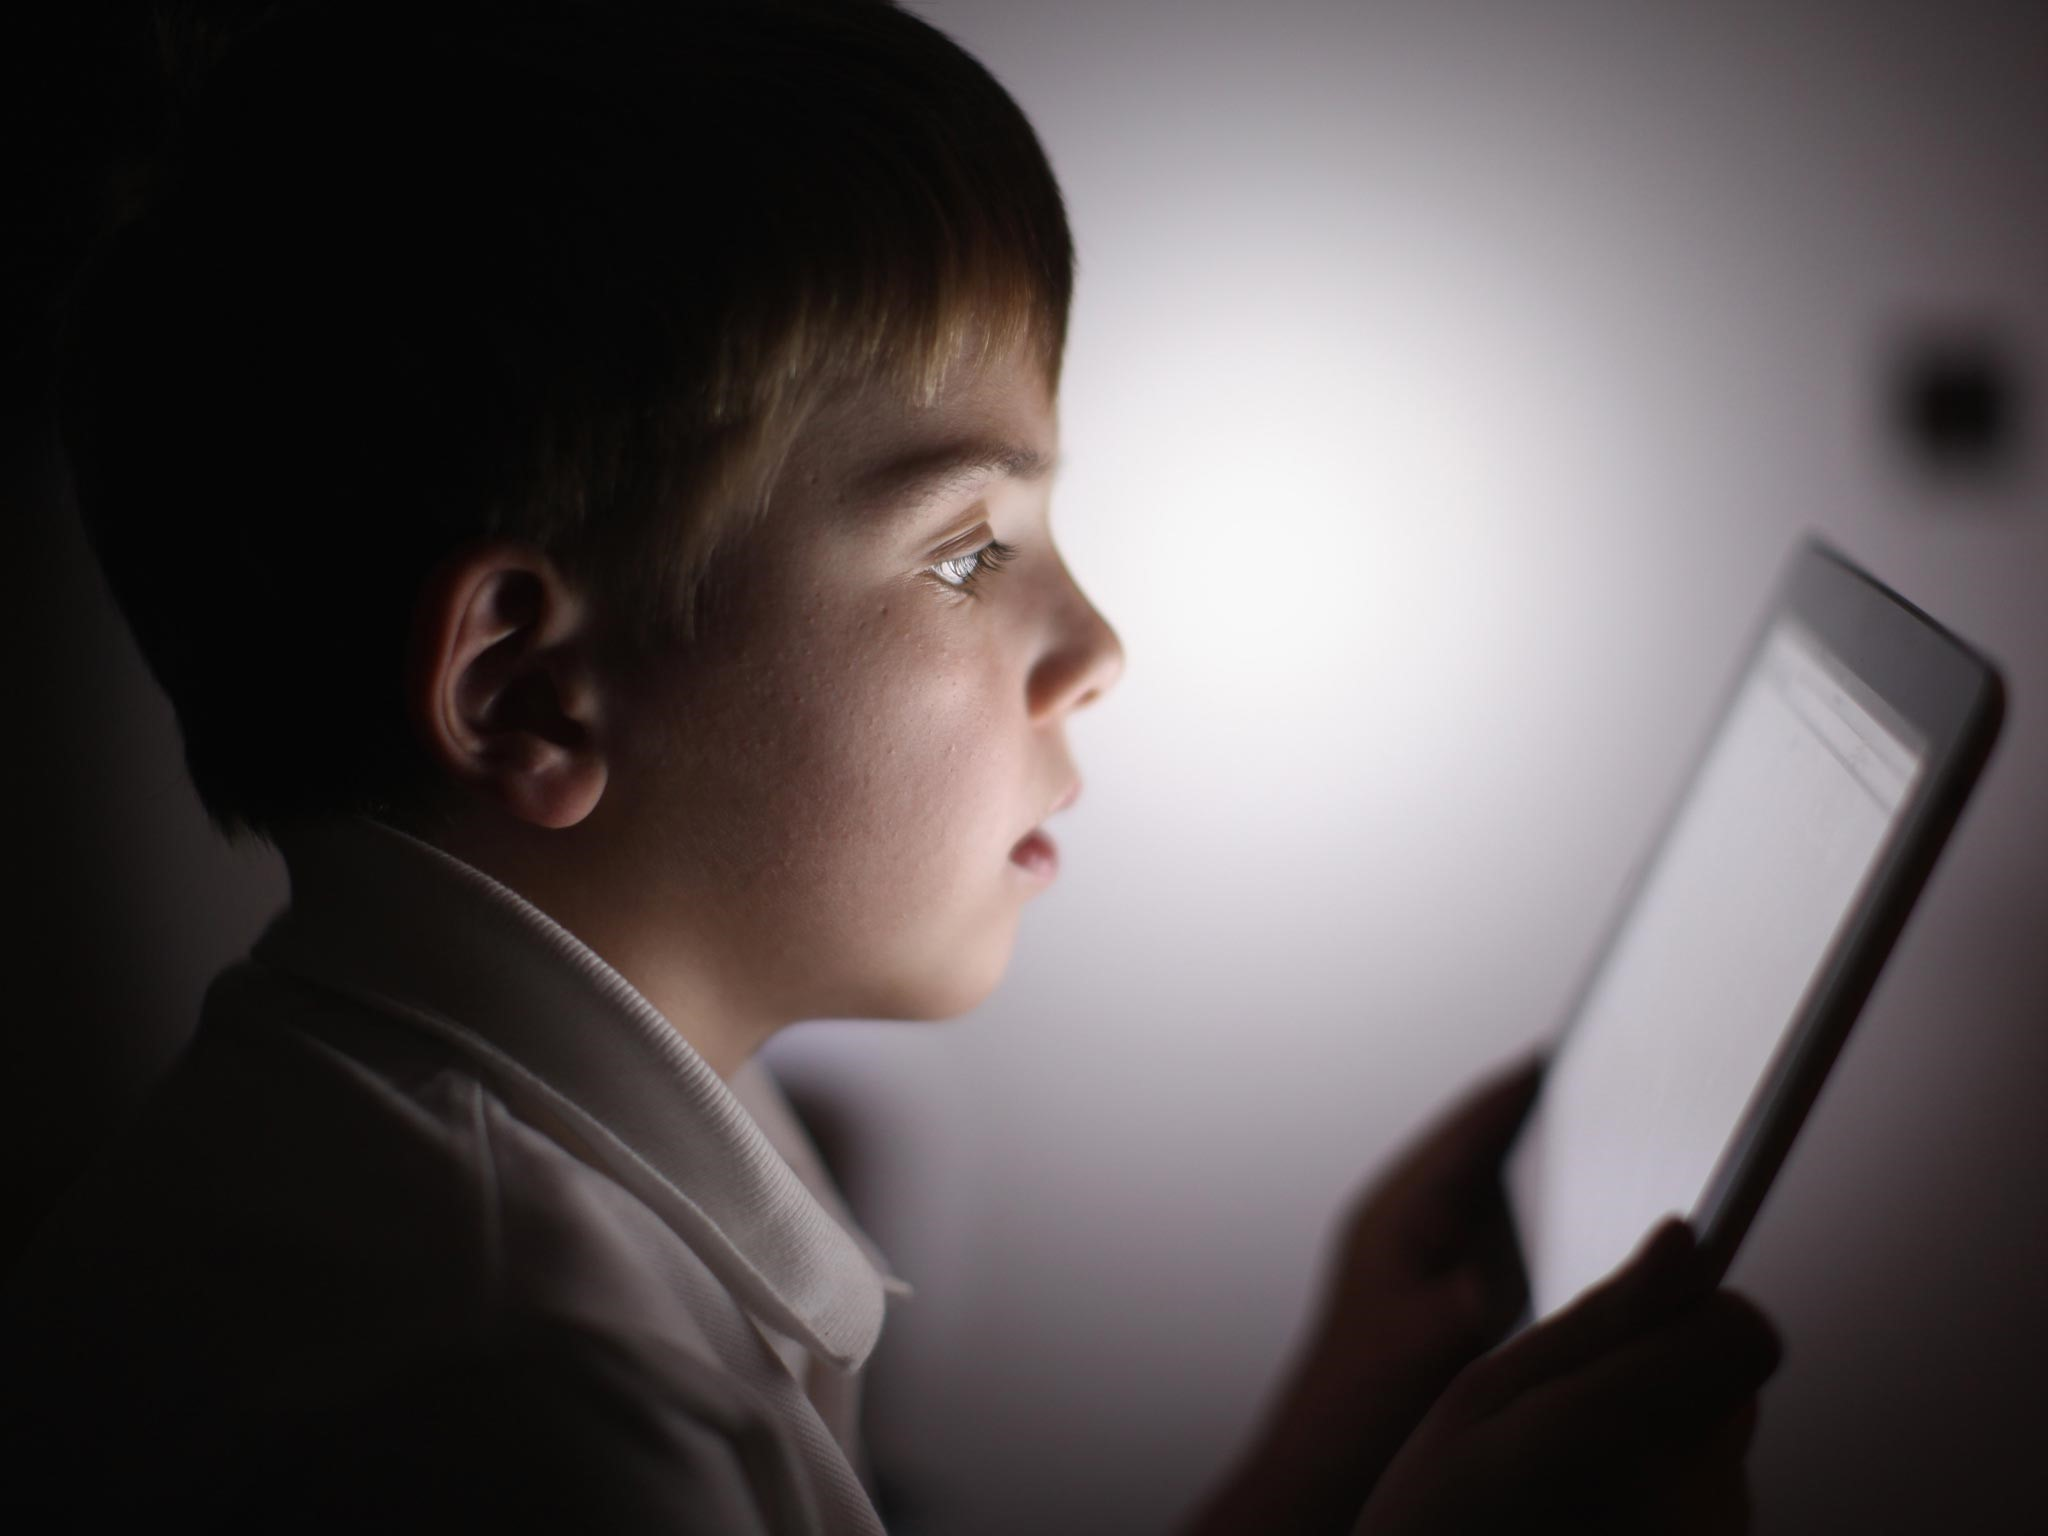 Dads, Batasi Gadget Supaya Perkembangan Si Kecil Tak Terhambat!